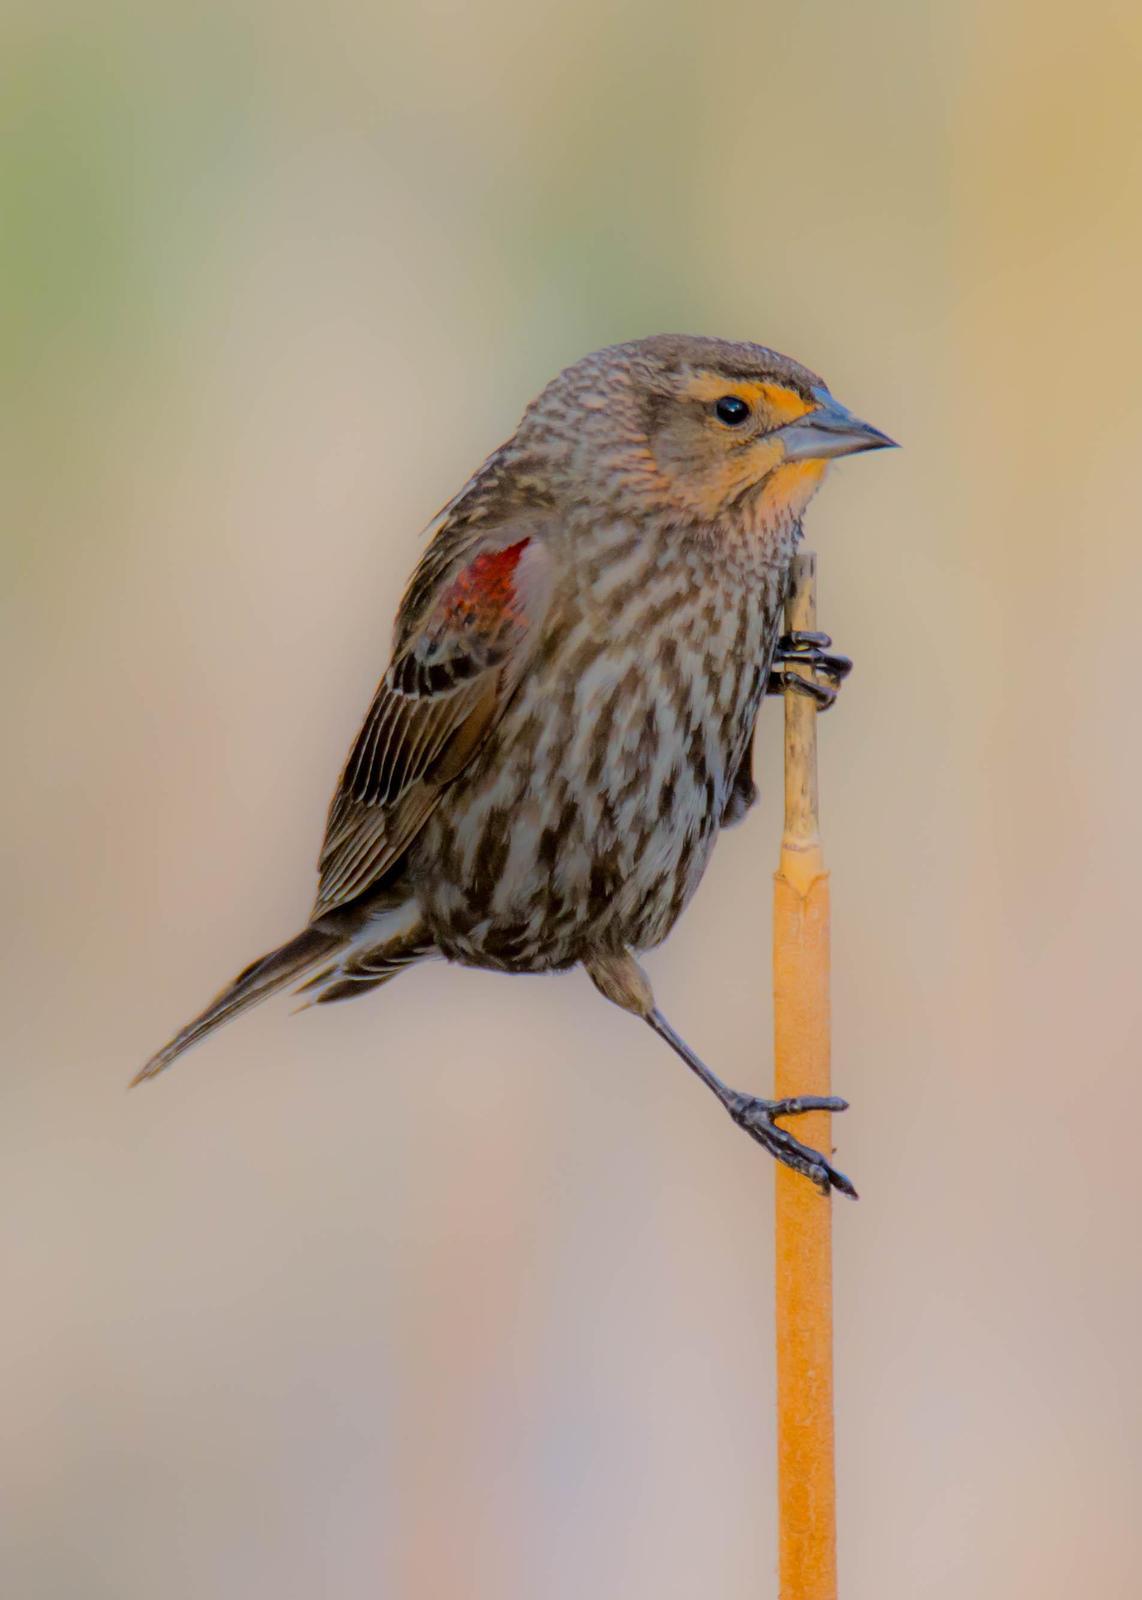 Red-winged Blackbird Photo by Karen Prisby